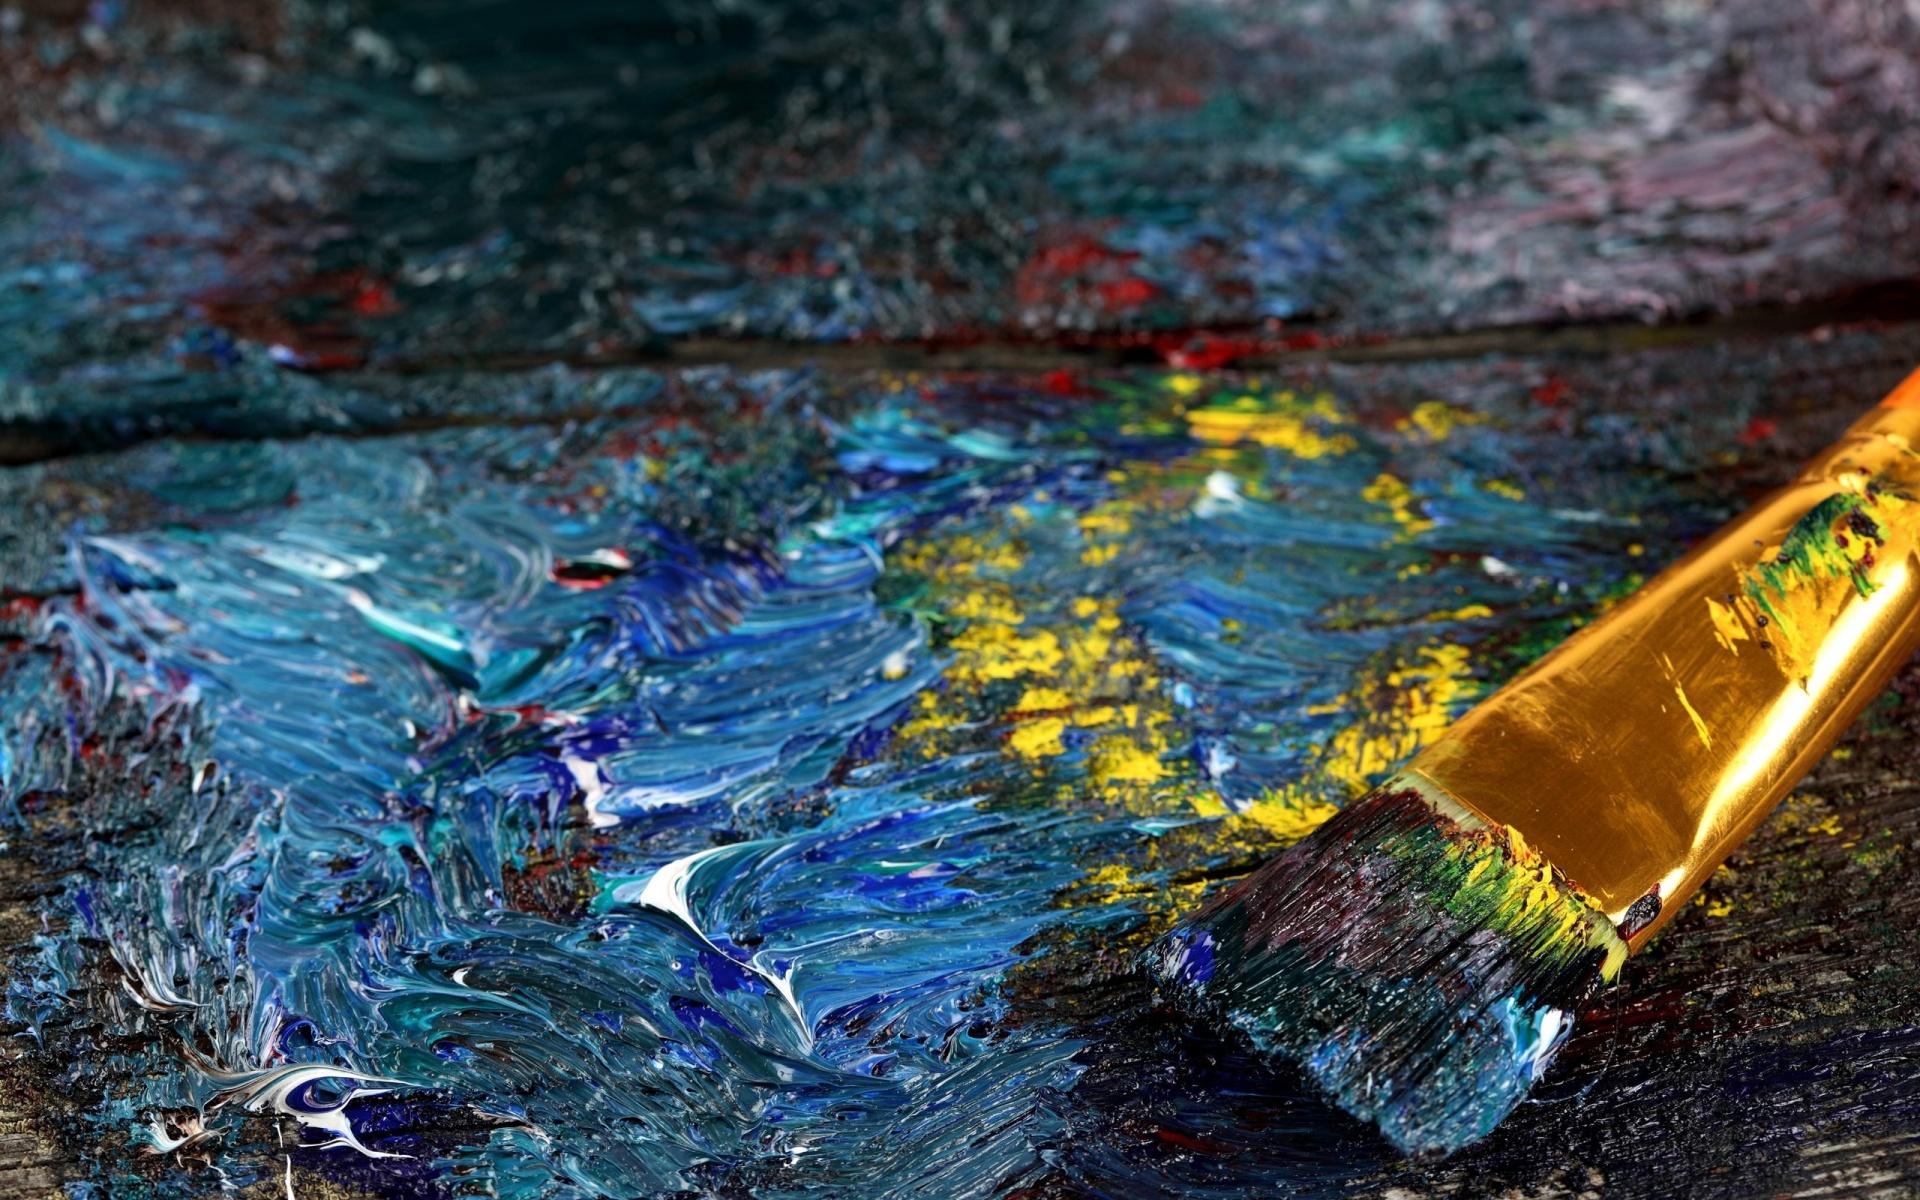 paint-wallpaper-3717-3936-hd-wallpapers